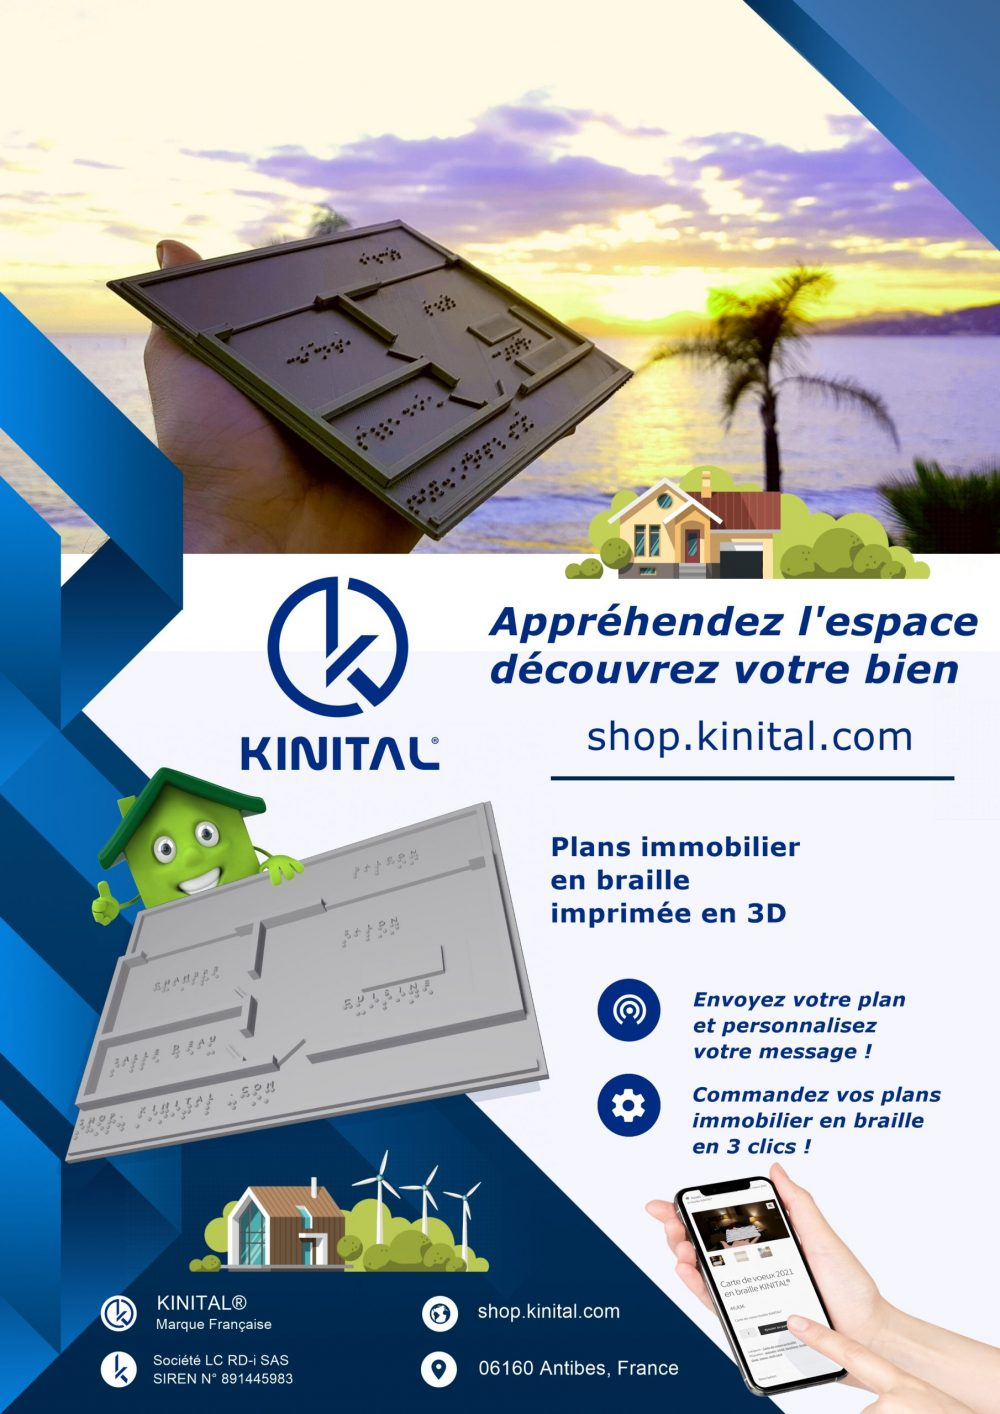 Flyers carte de plan immobilier en Braille Kinital® Shop.Kinital.com